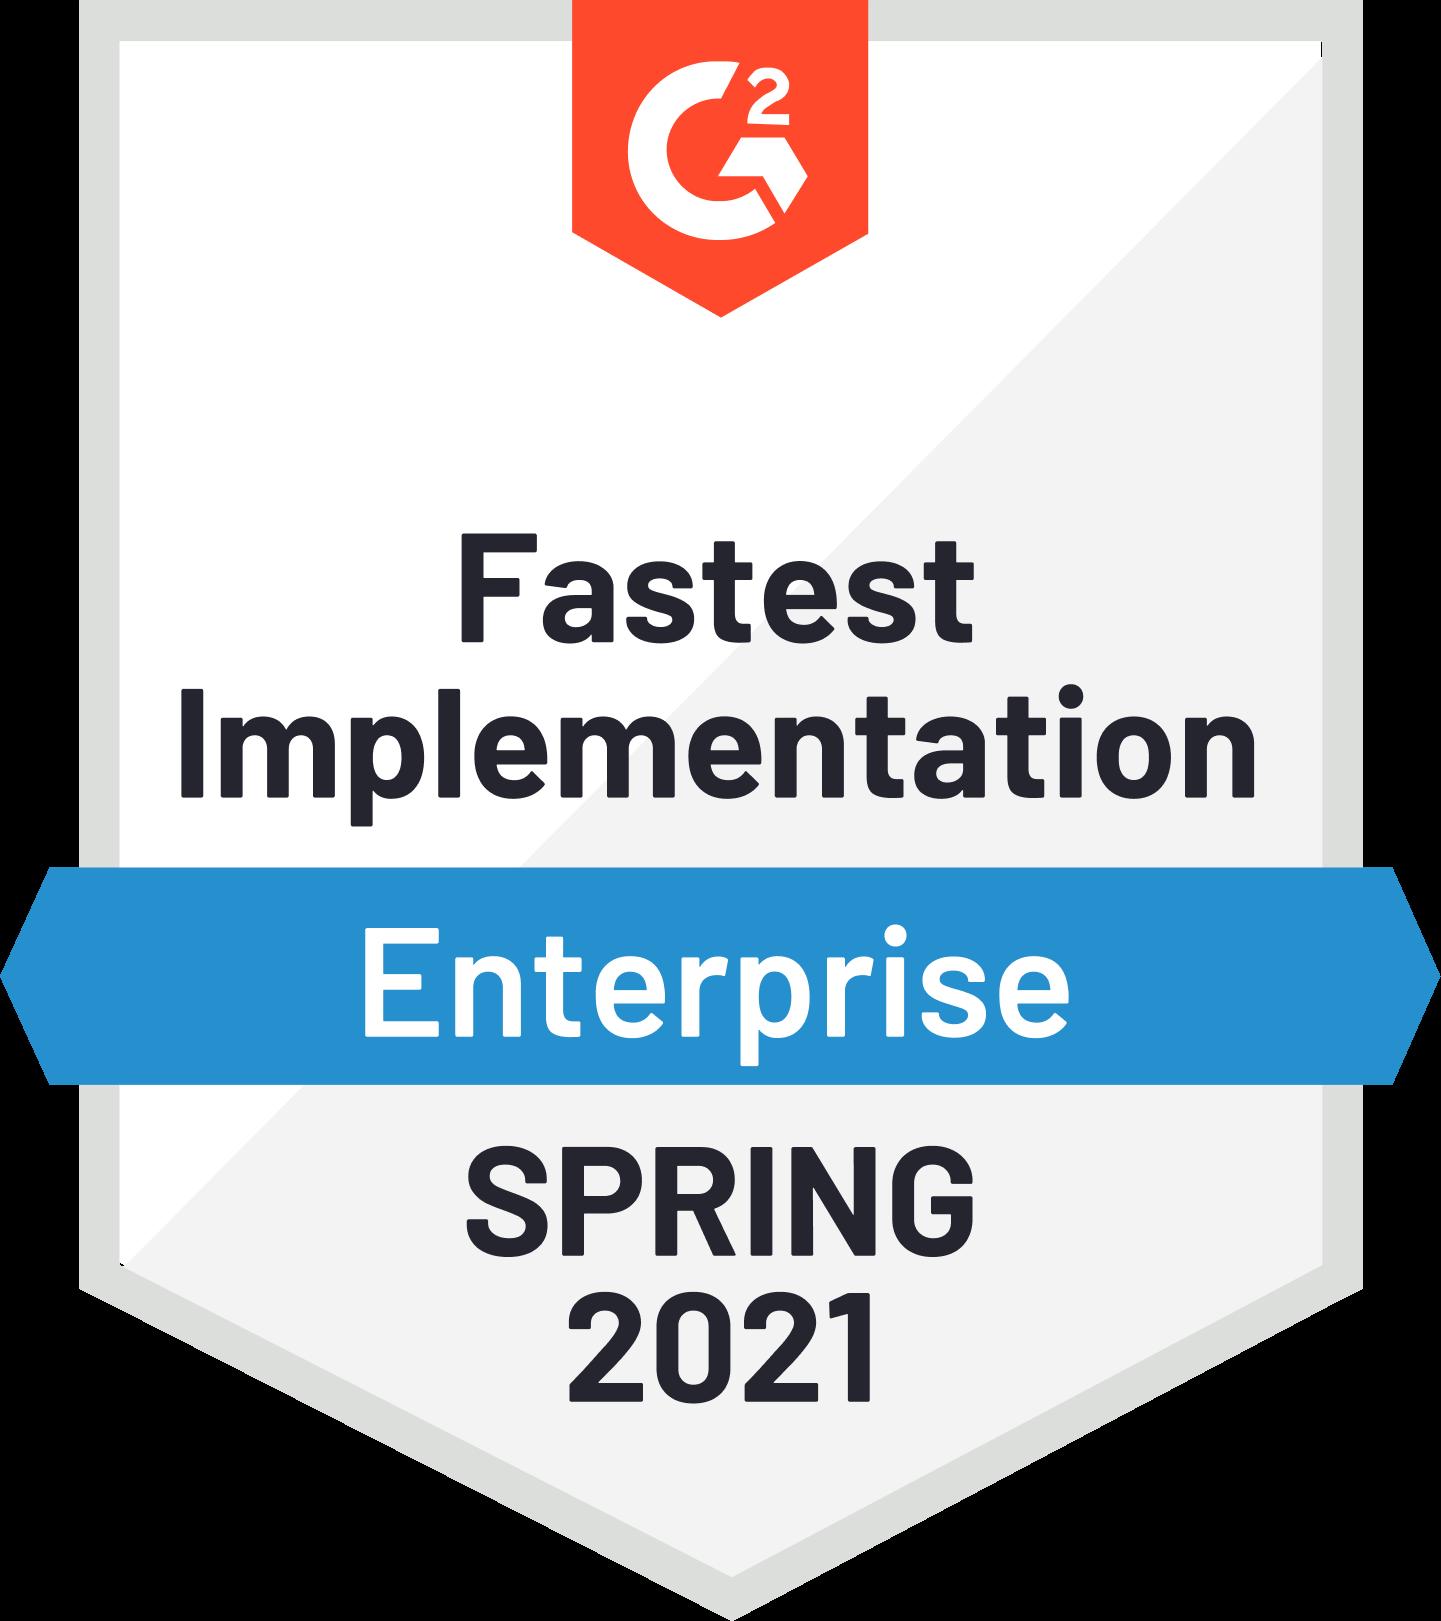 Fastest Implementation - Enterprise